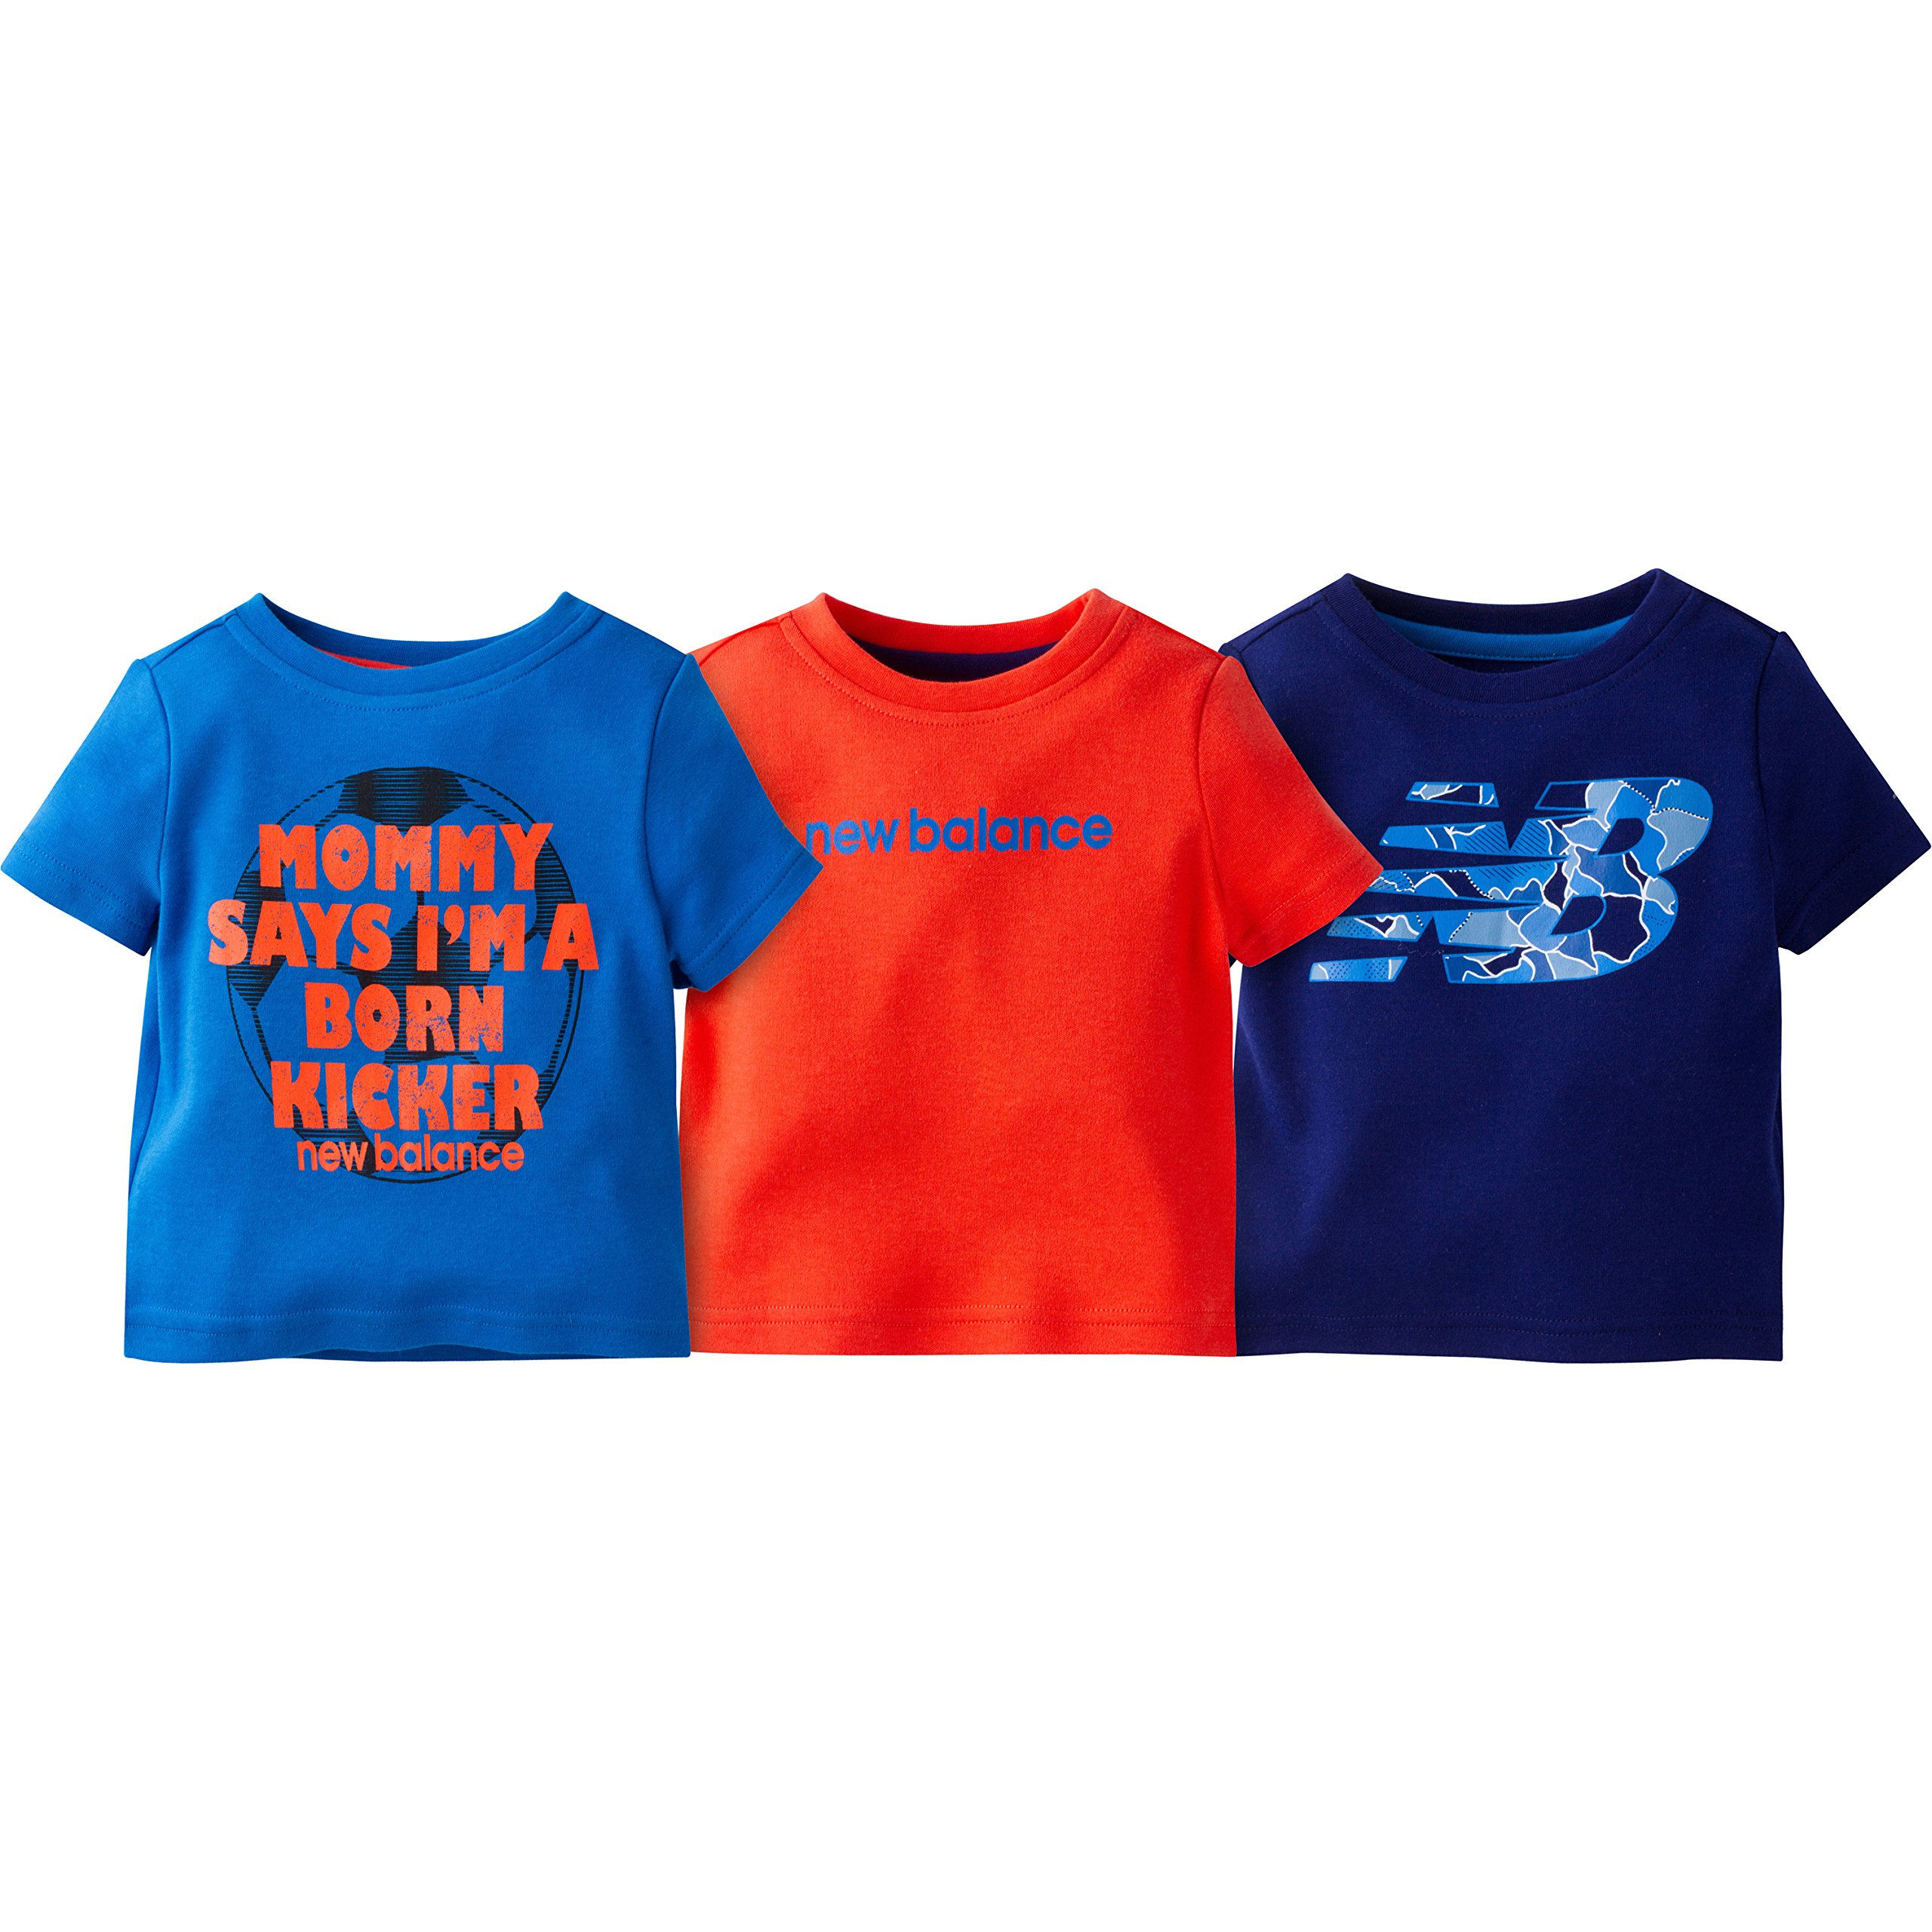 New Balance 男童 3 件装图案 T 恤